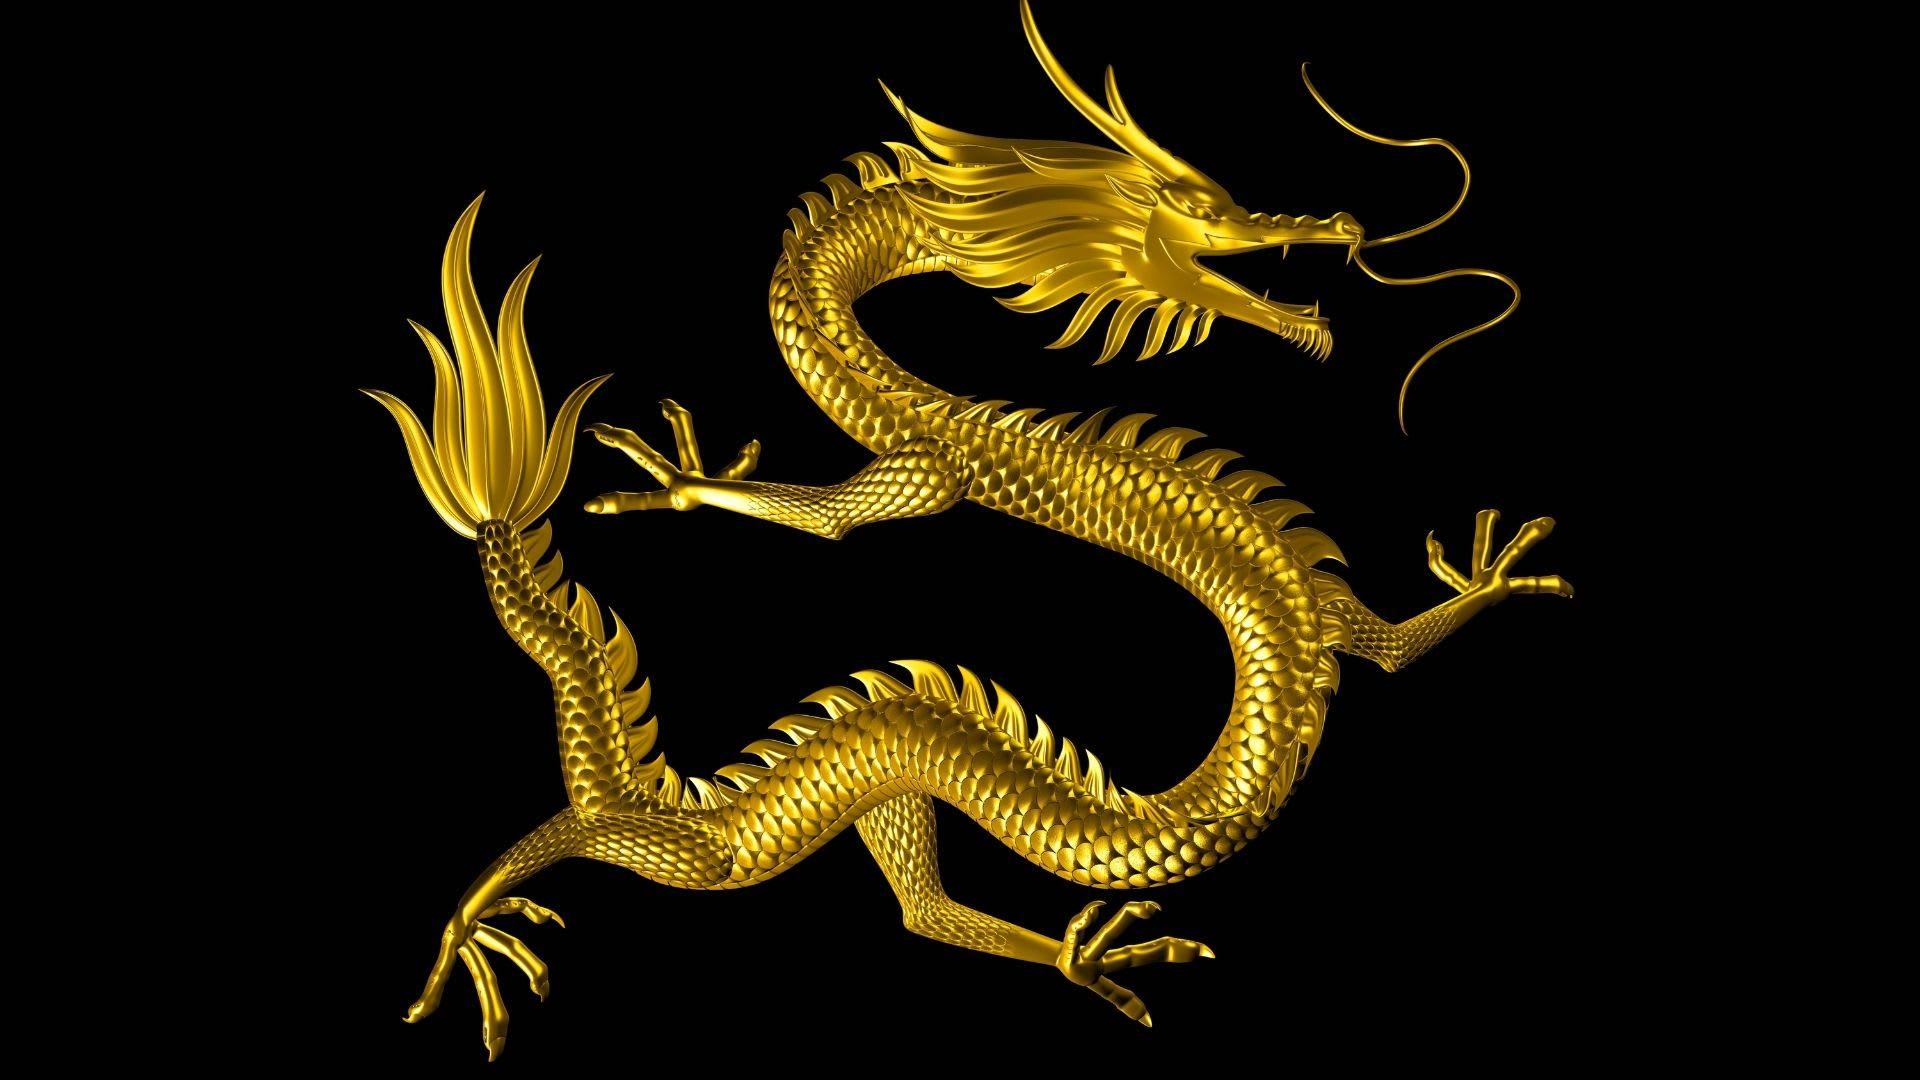 Live Dragon Tiger Kasiinode tehnoloogia